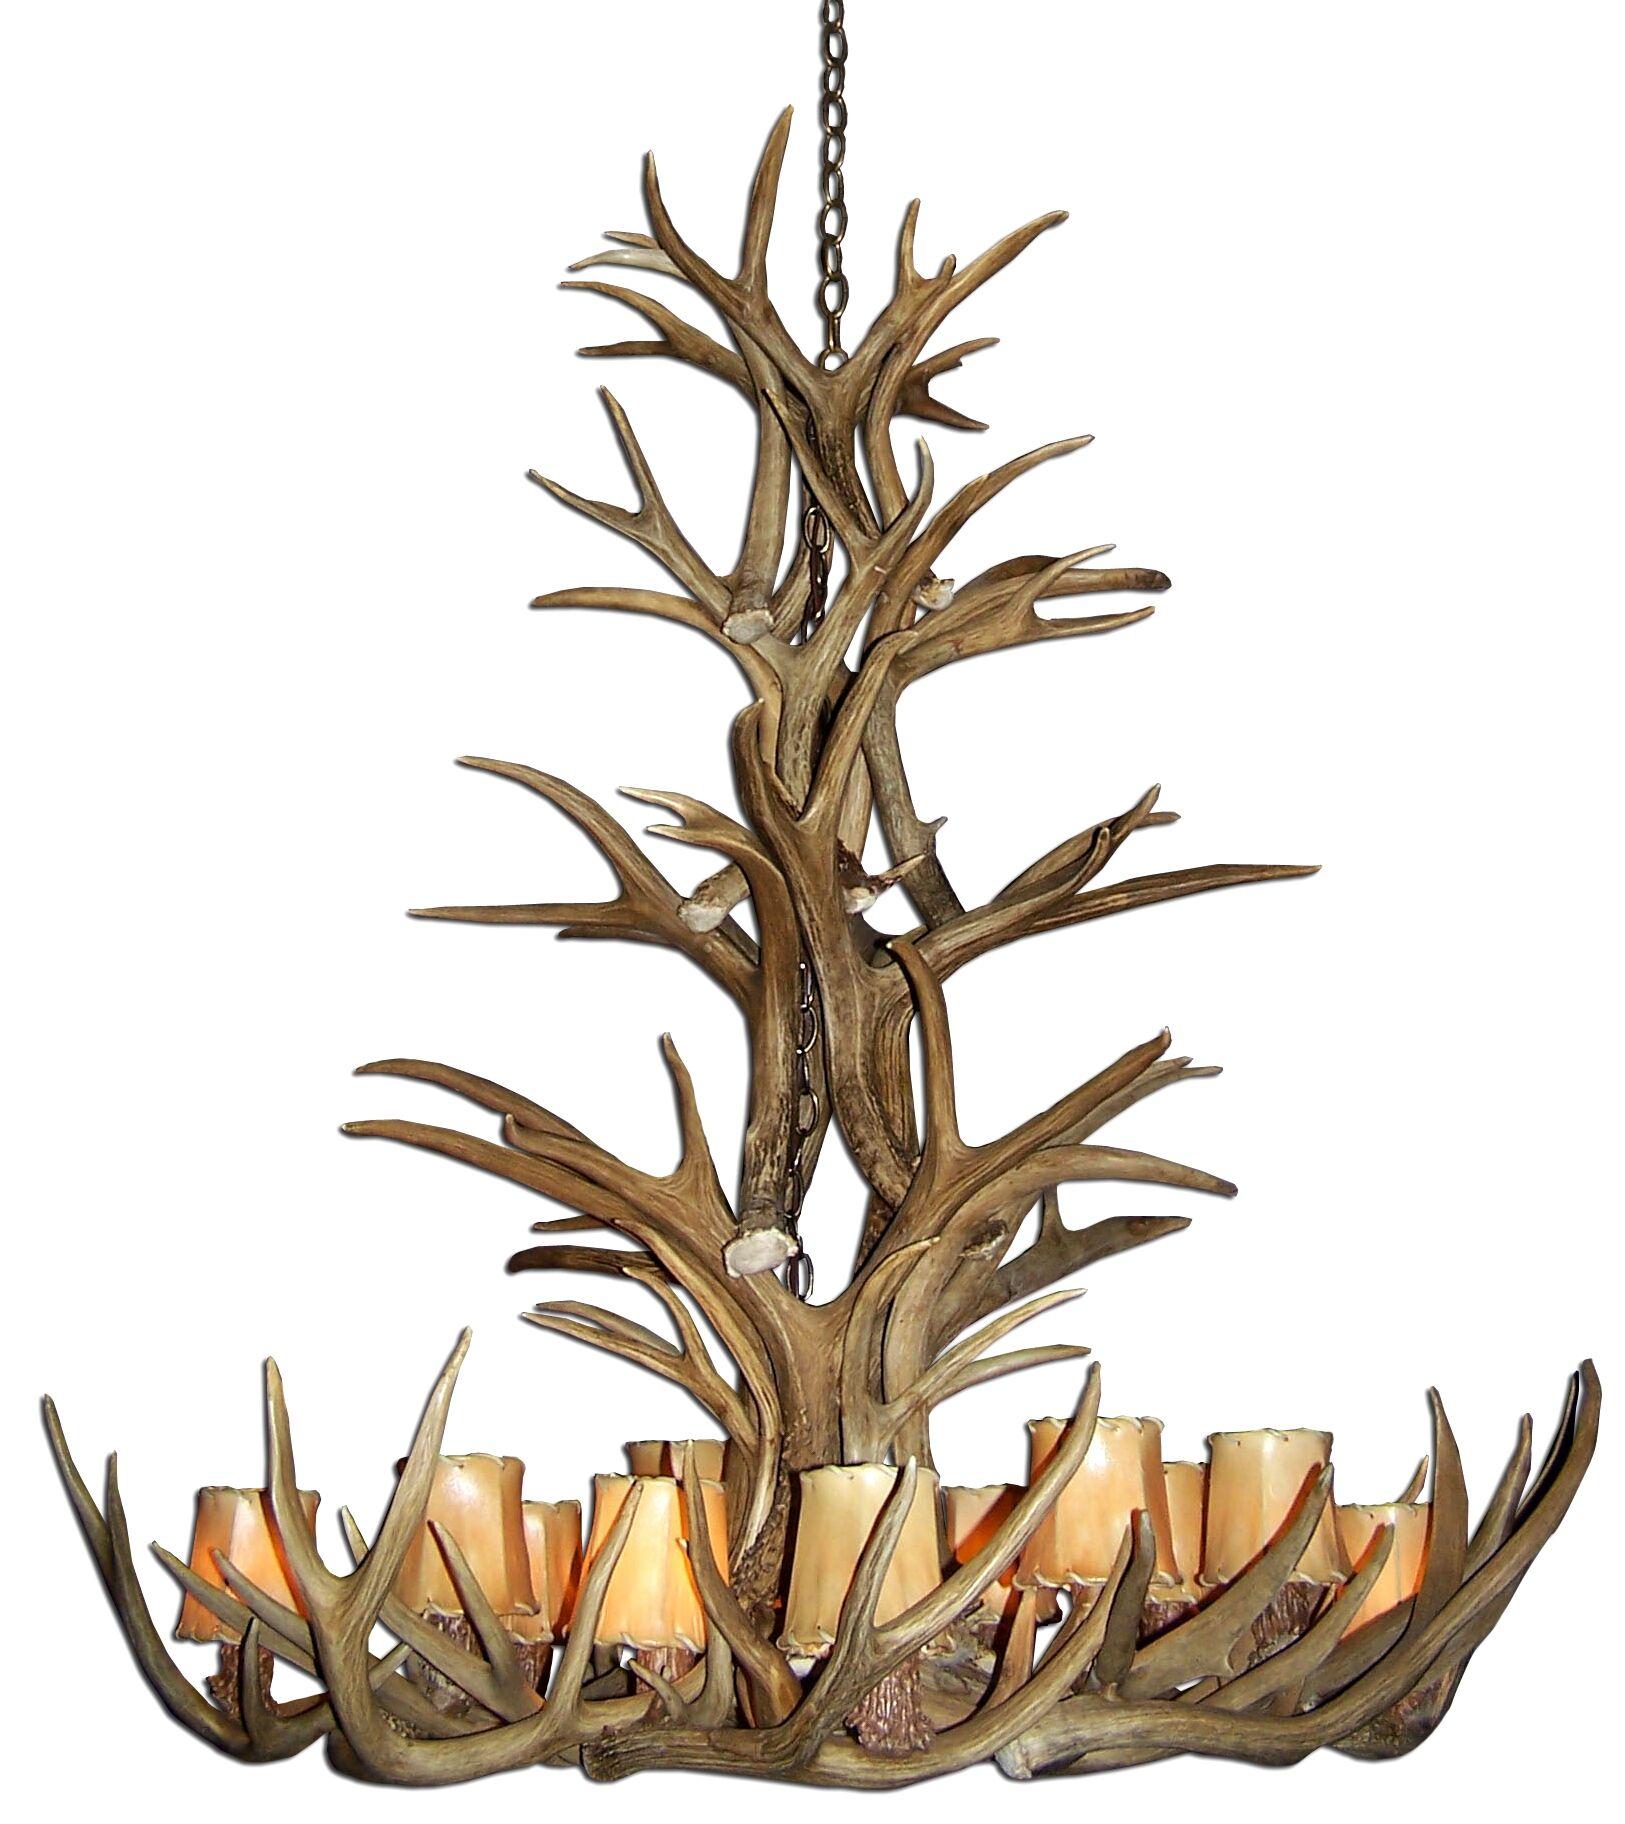 Doliya Antler Mule Deer 12-Light We have associated to option Chandelier Finish: Black/Natural Brown, Shade Color: Rawhide, Shade Included: Yes